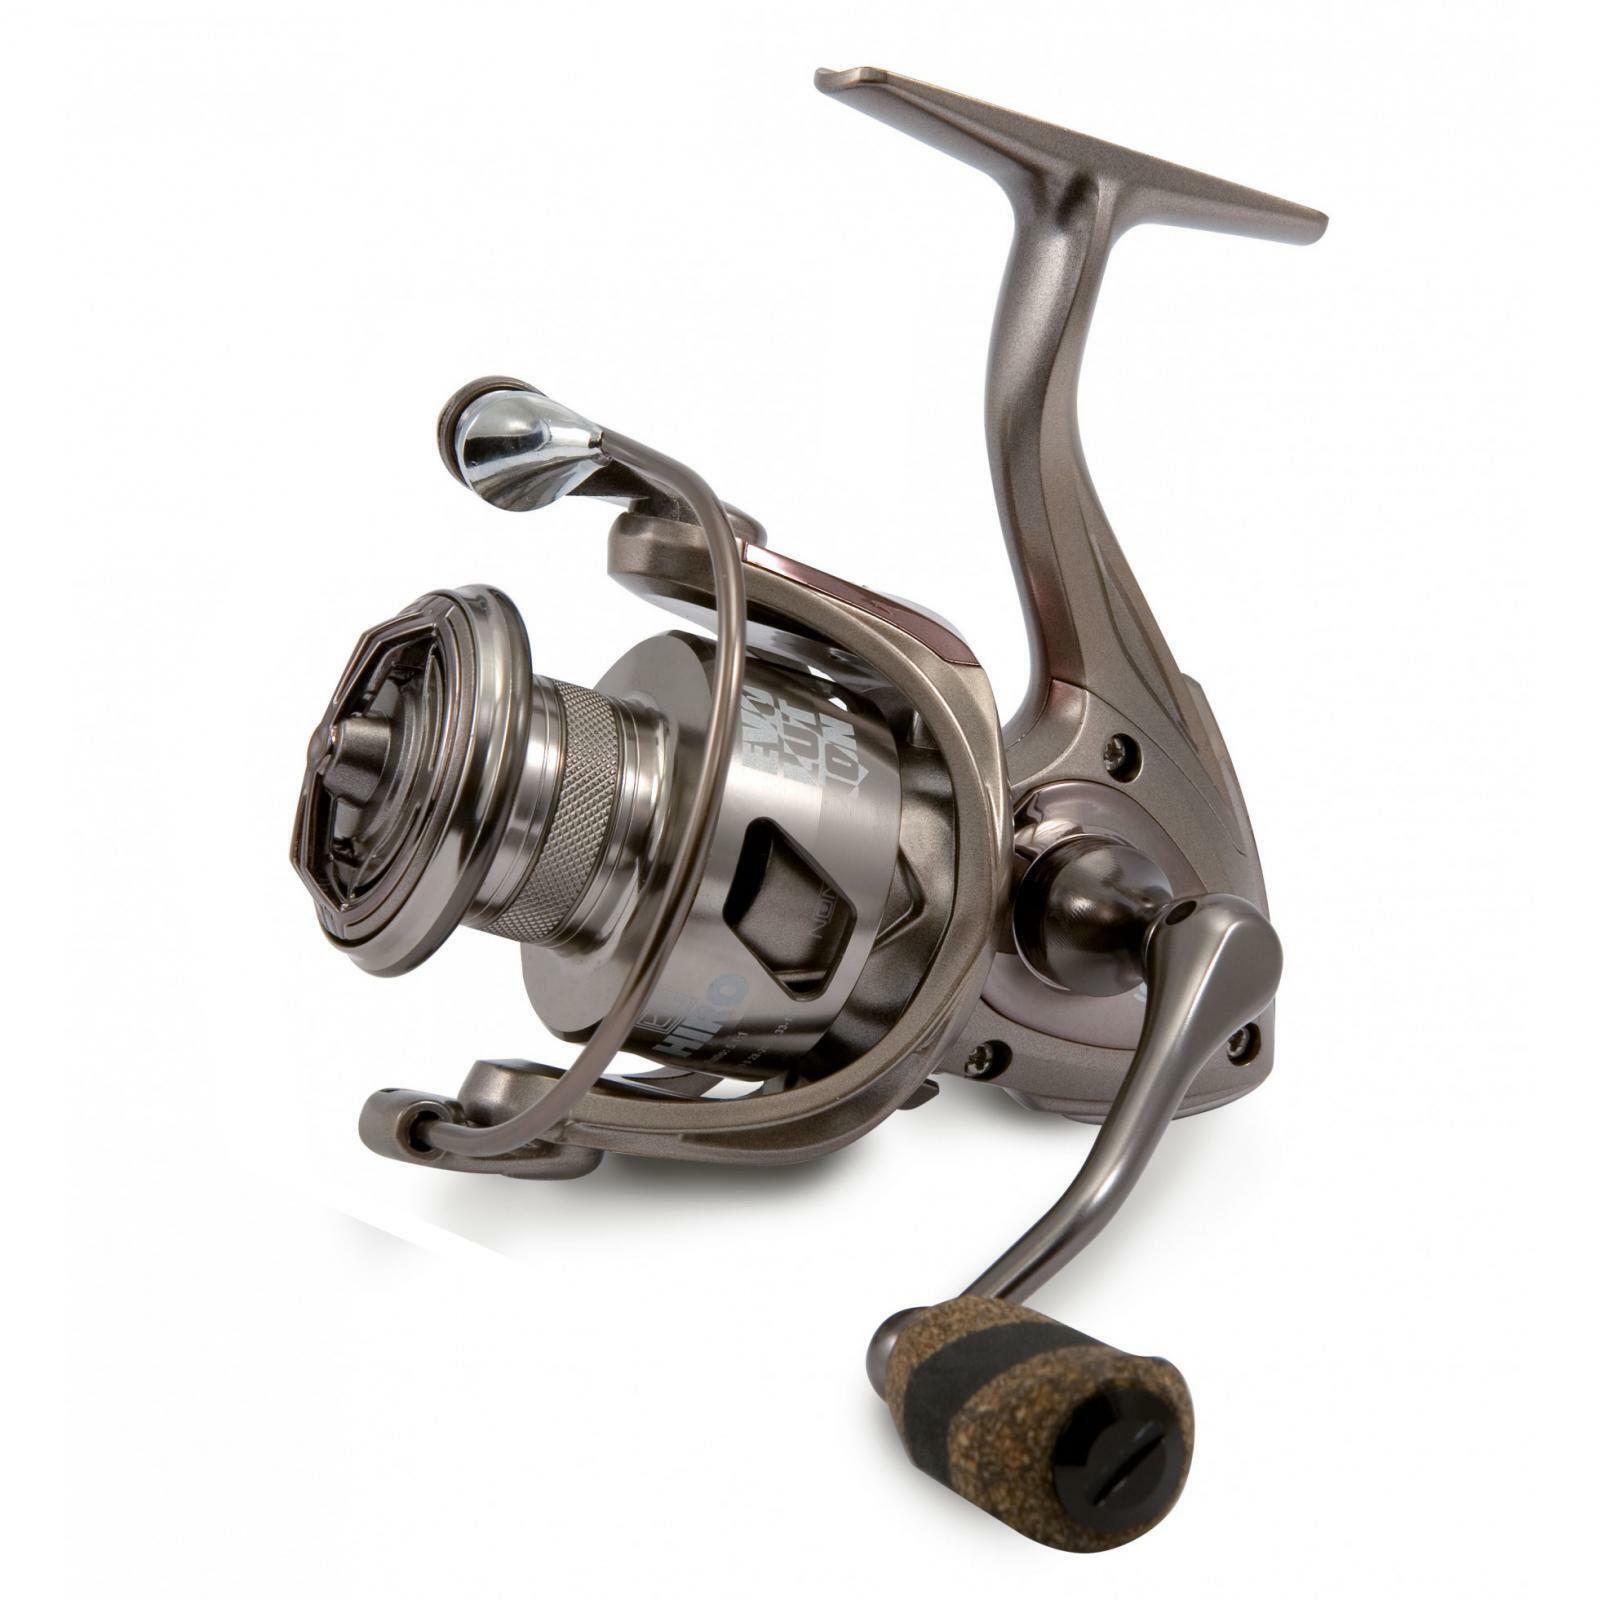 NM10331140 Mulinello Pesca Nomura Hiro Evolution 4000 Hilado 10+1 Bb FEU